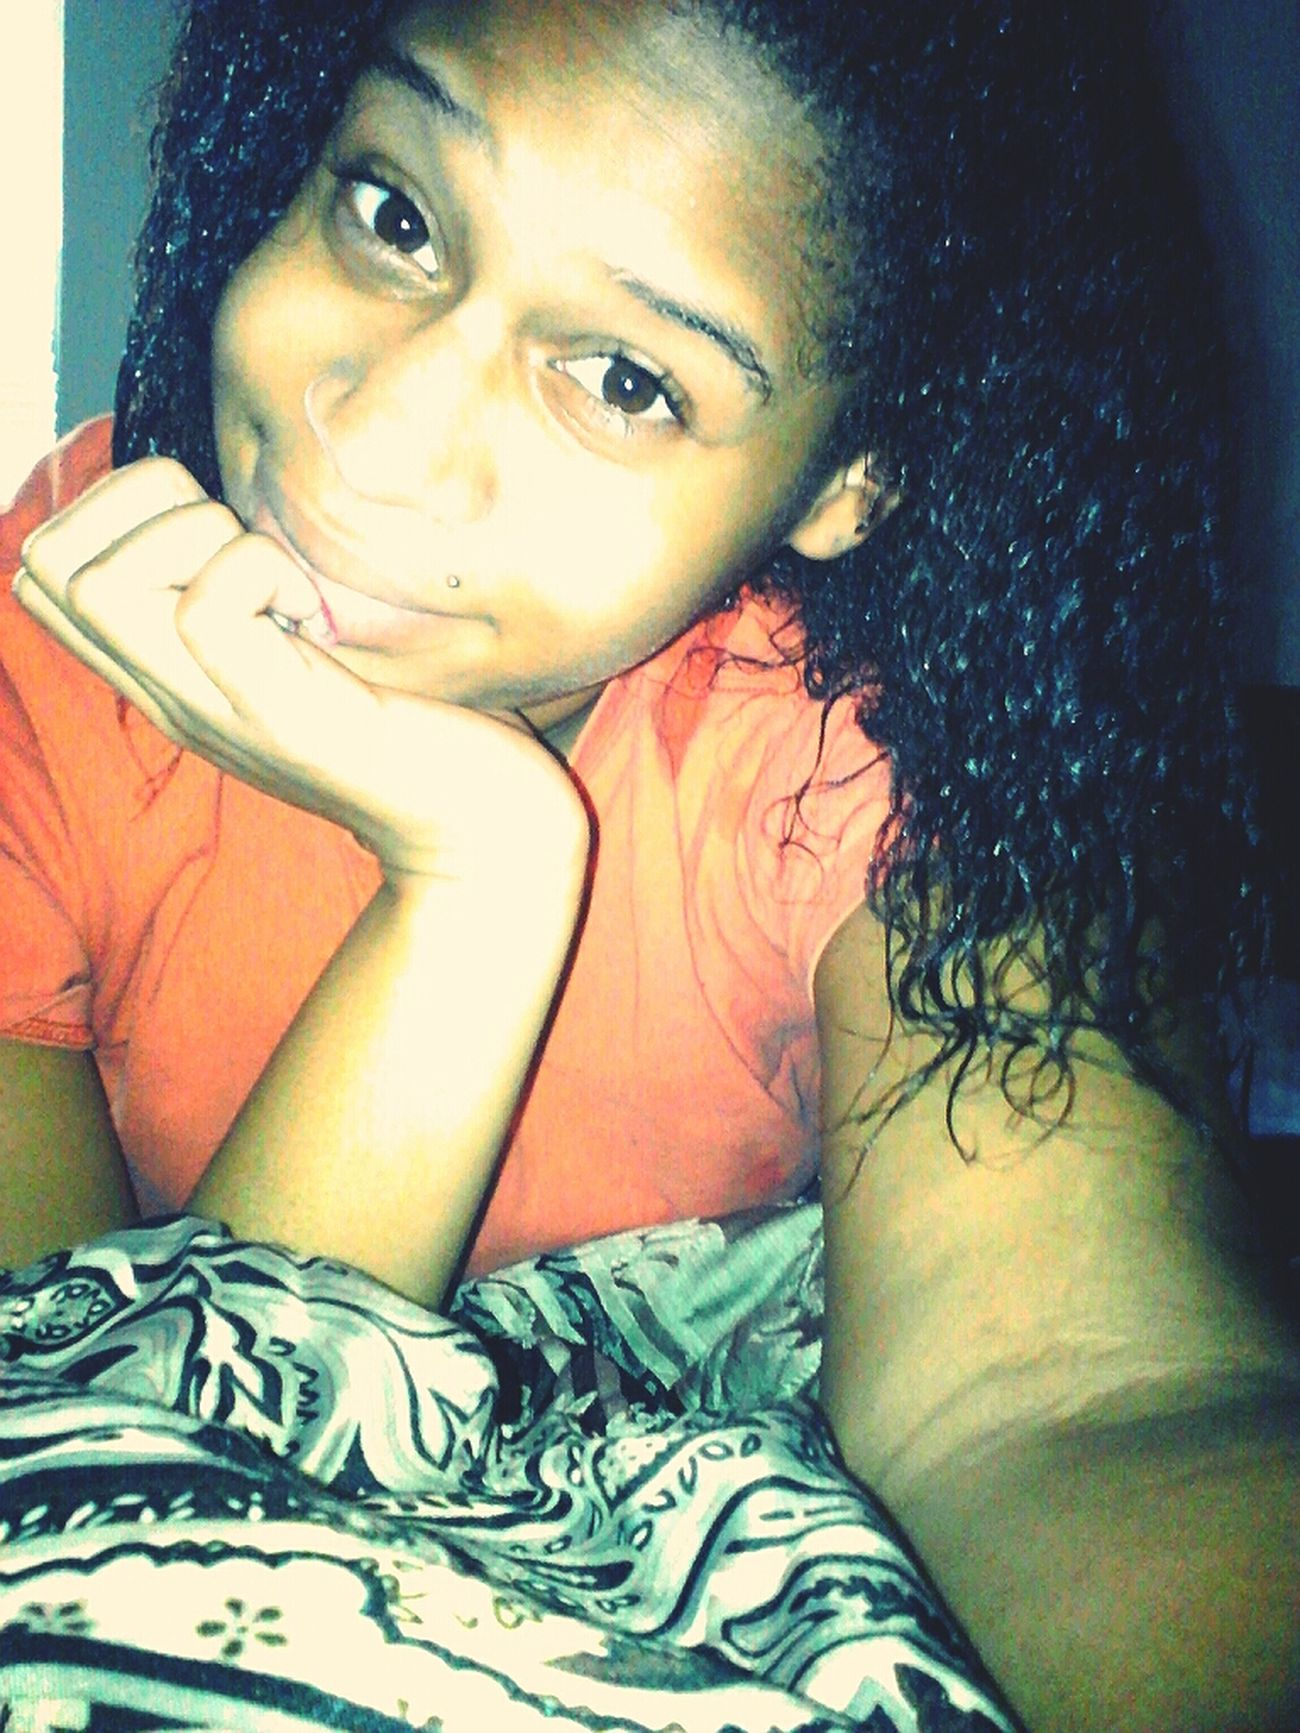 Ya Im bored.